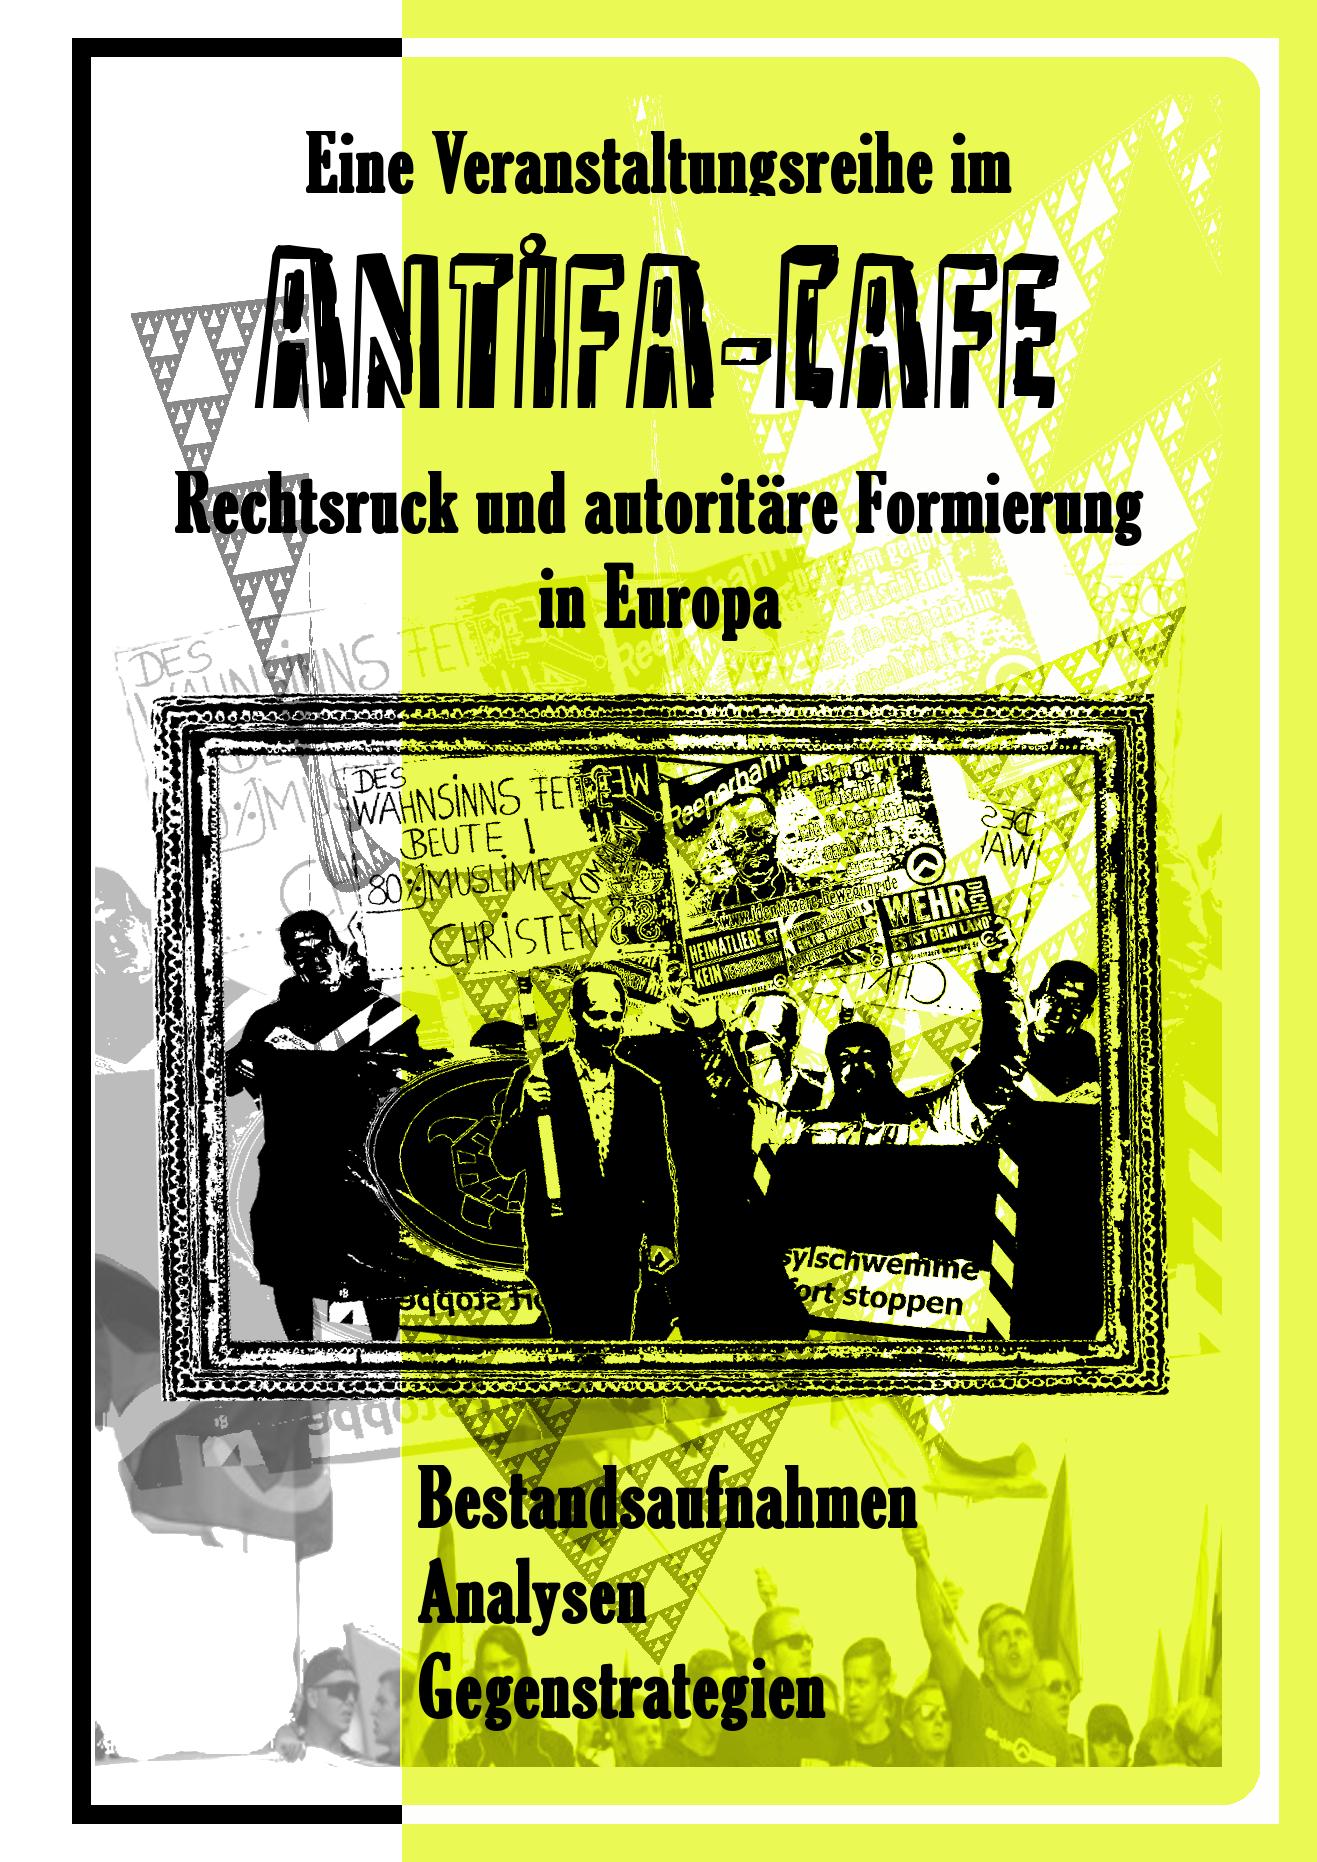 http://www.neu.antifa-kiel.org/wp-content/uploads/import/antifa-cafe/cafereheihekomplett.jpeg